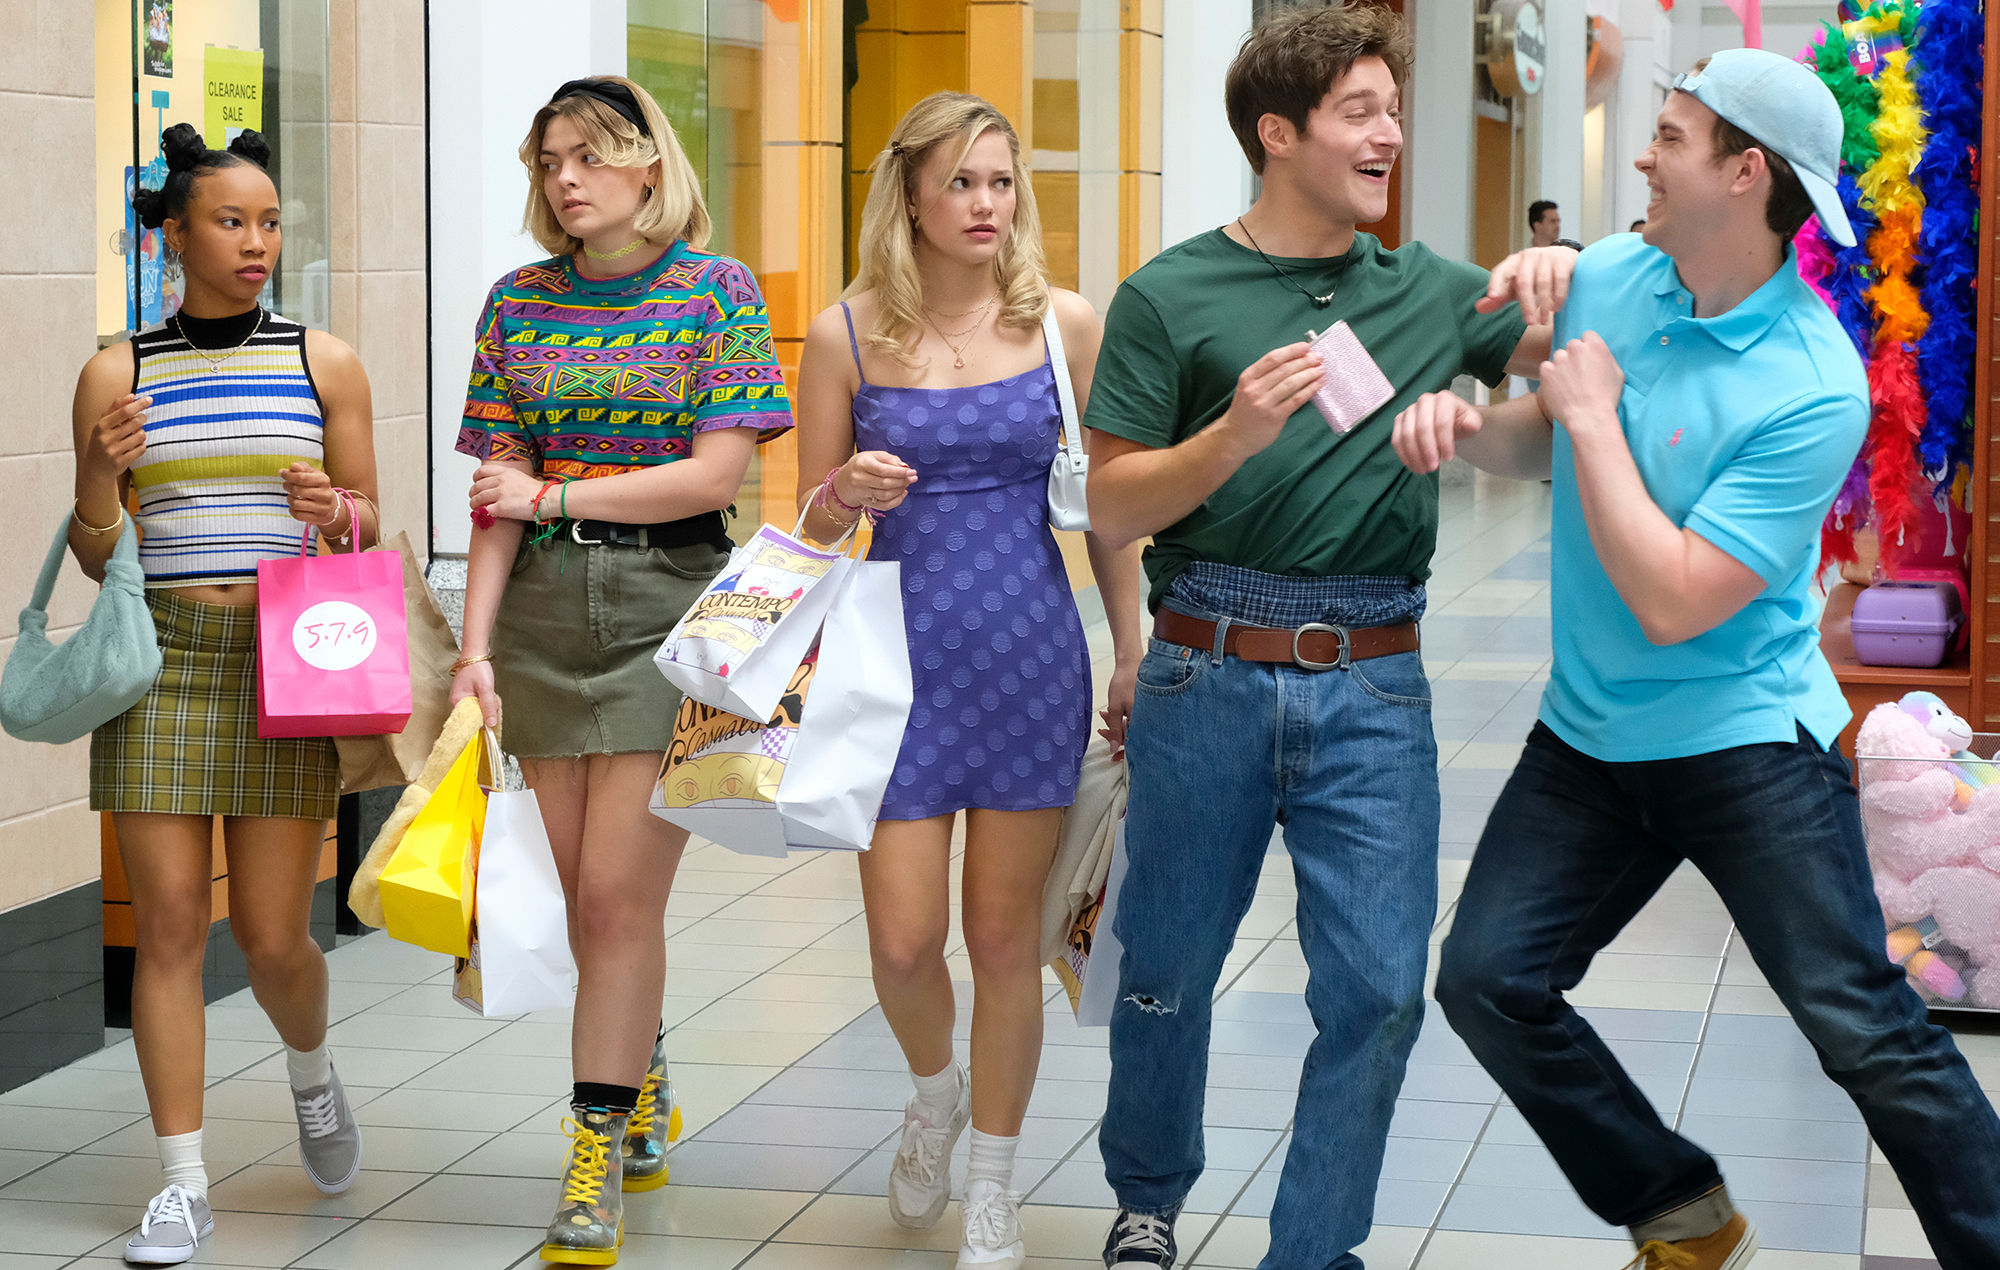 Cruel Summer' is a gripping teen mystery set in '90s smalltown suburbia